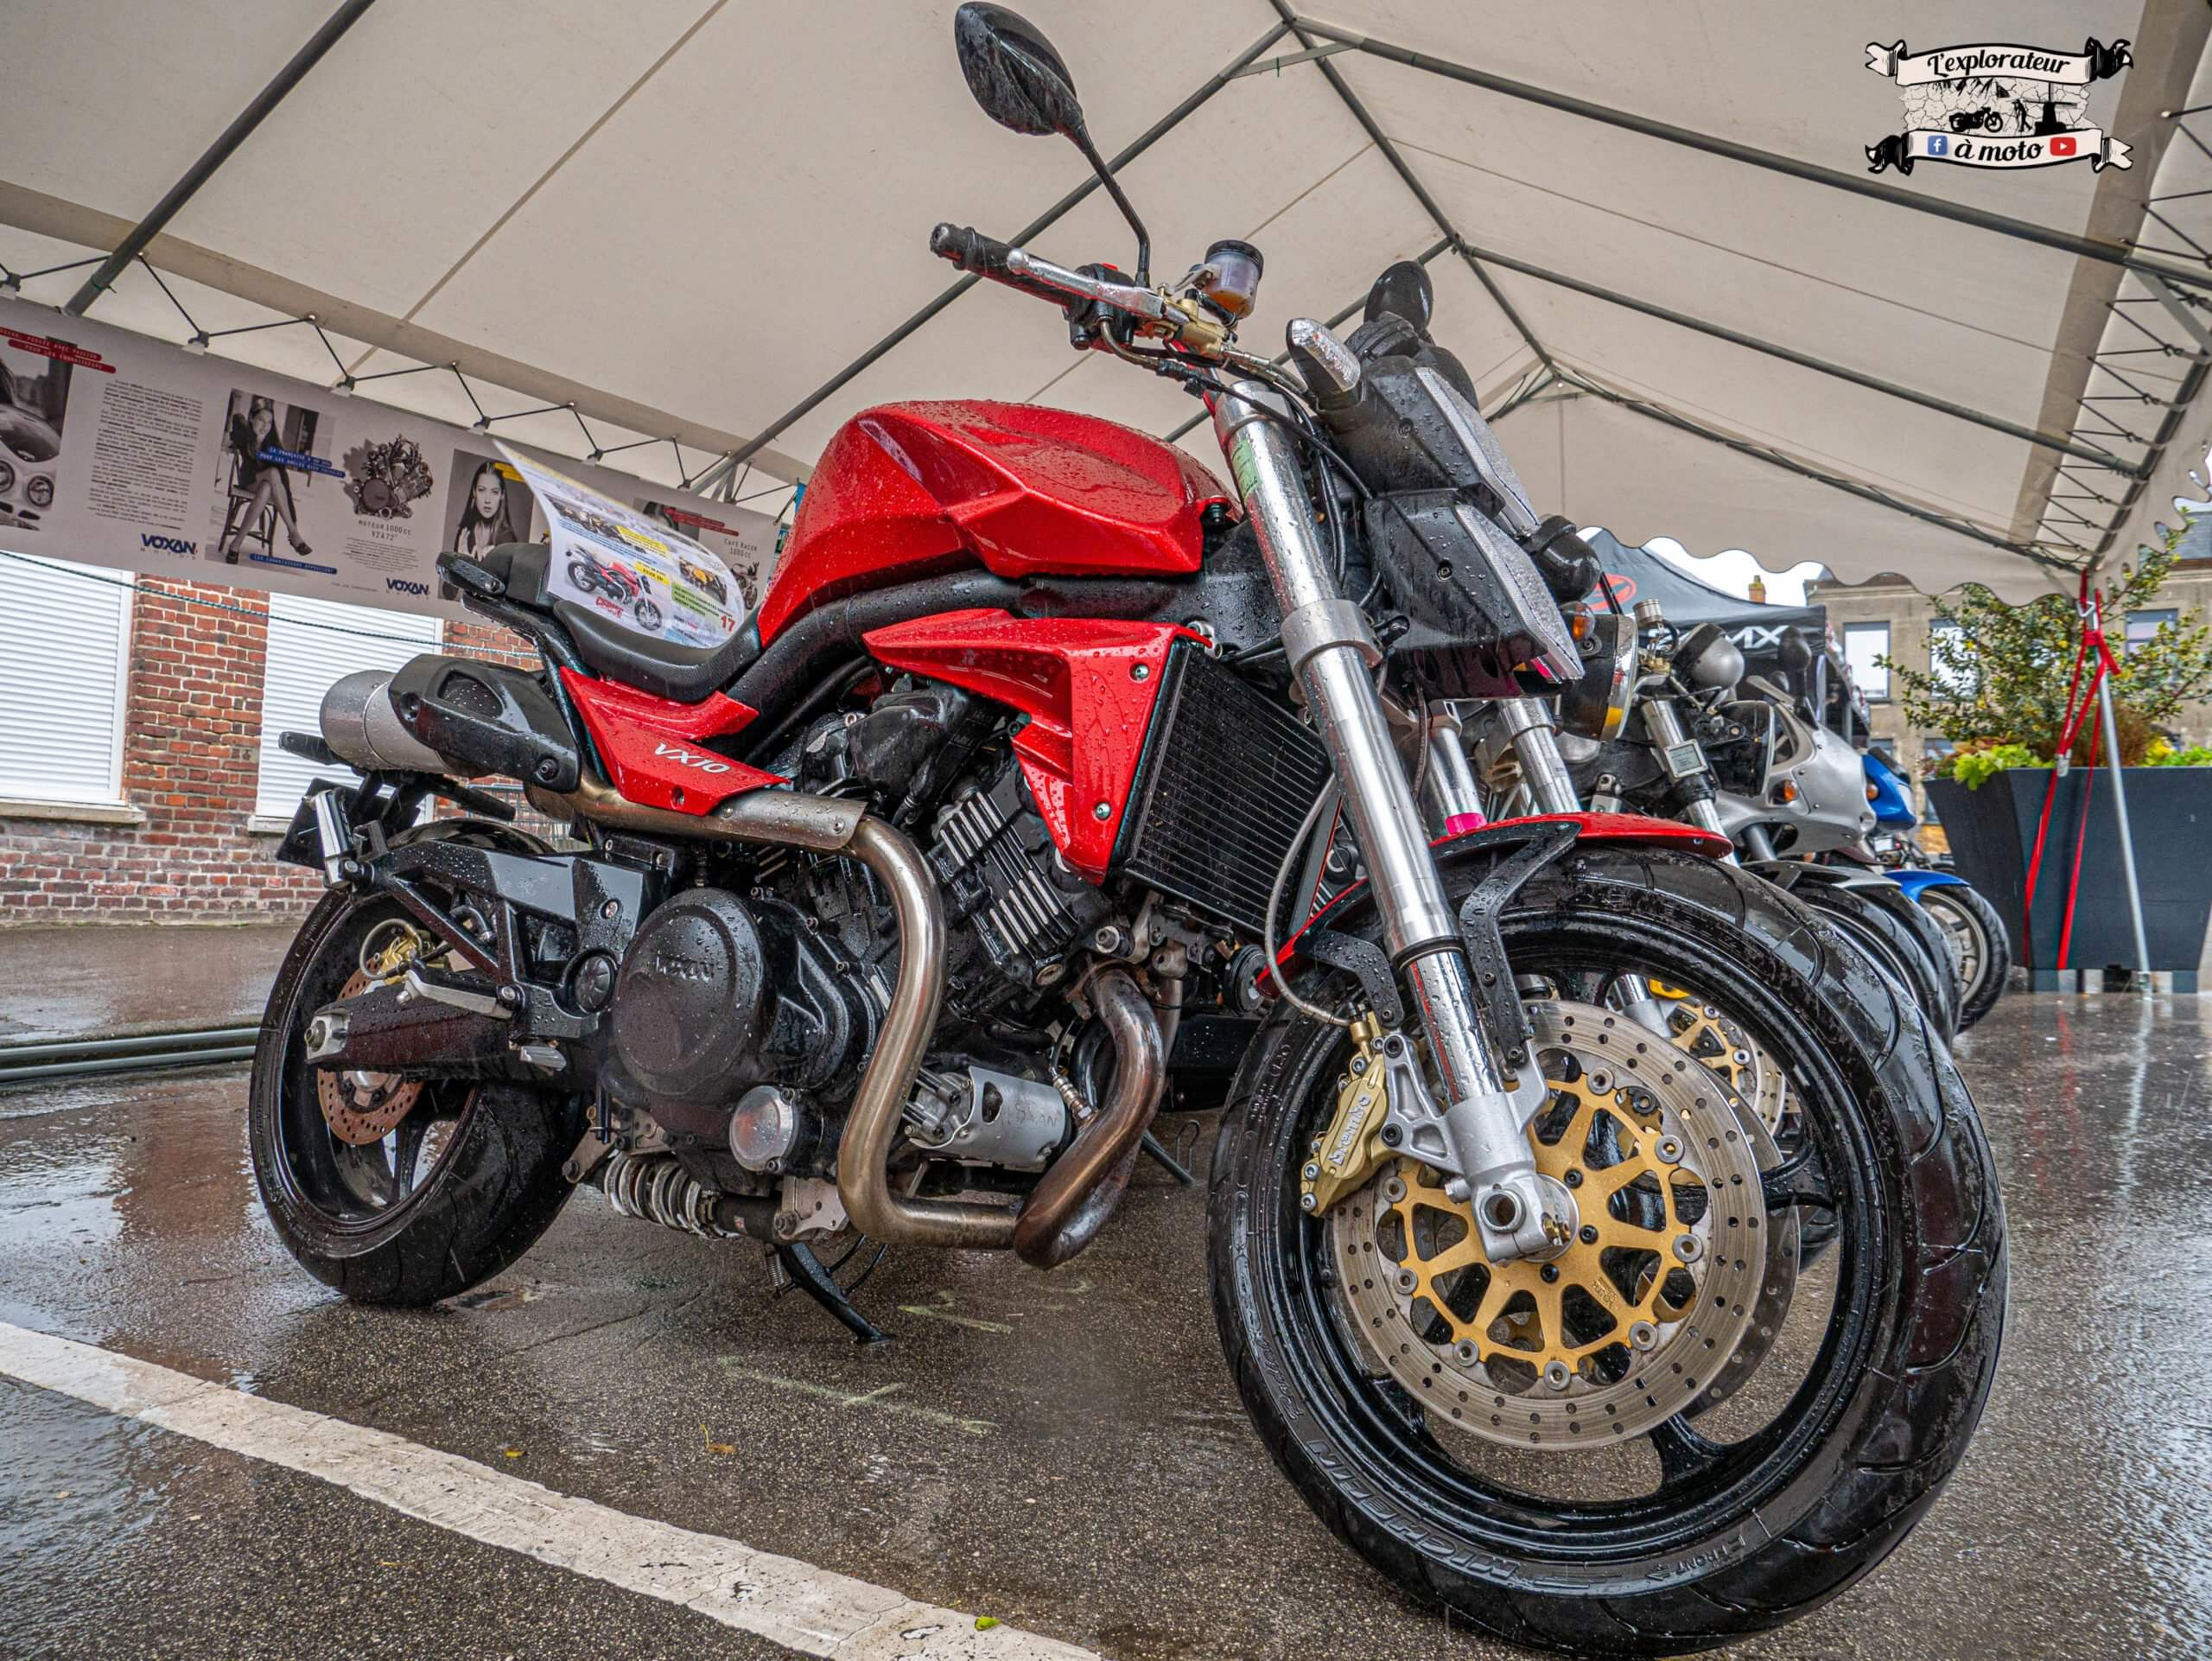 Une moto rouge, Voxan VX-10